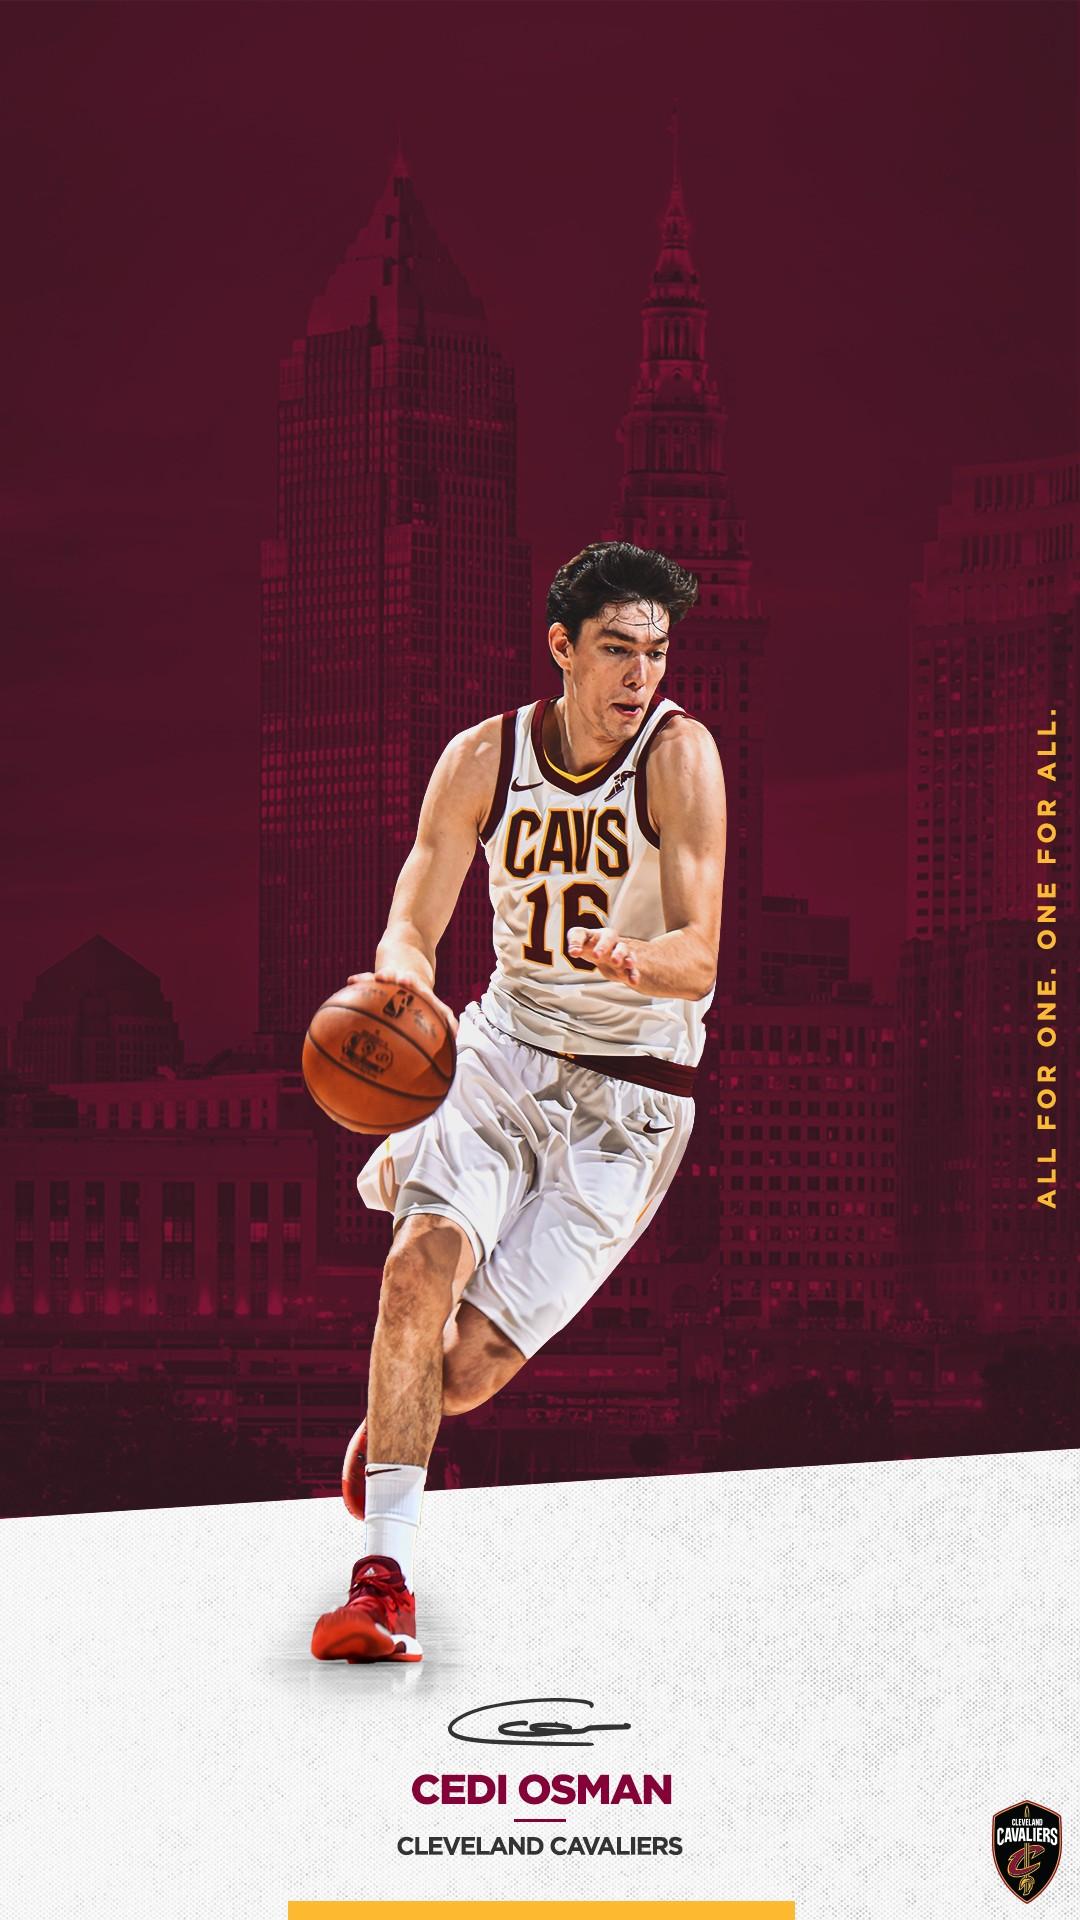 Cool Mac Wallpapers Hd Free Cedi Osman Mobile Wallpaper 2019 Basketball Wallpaper